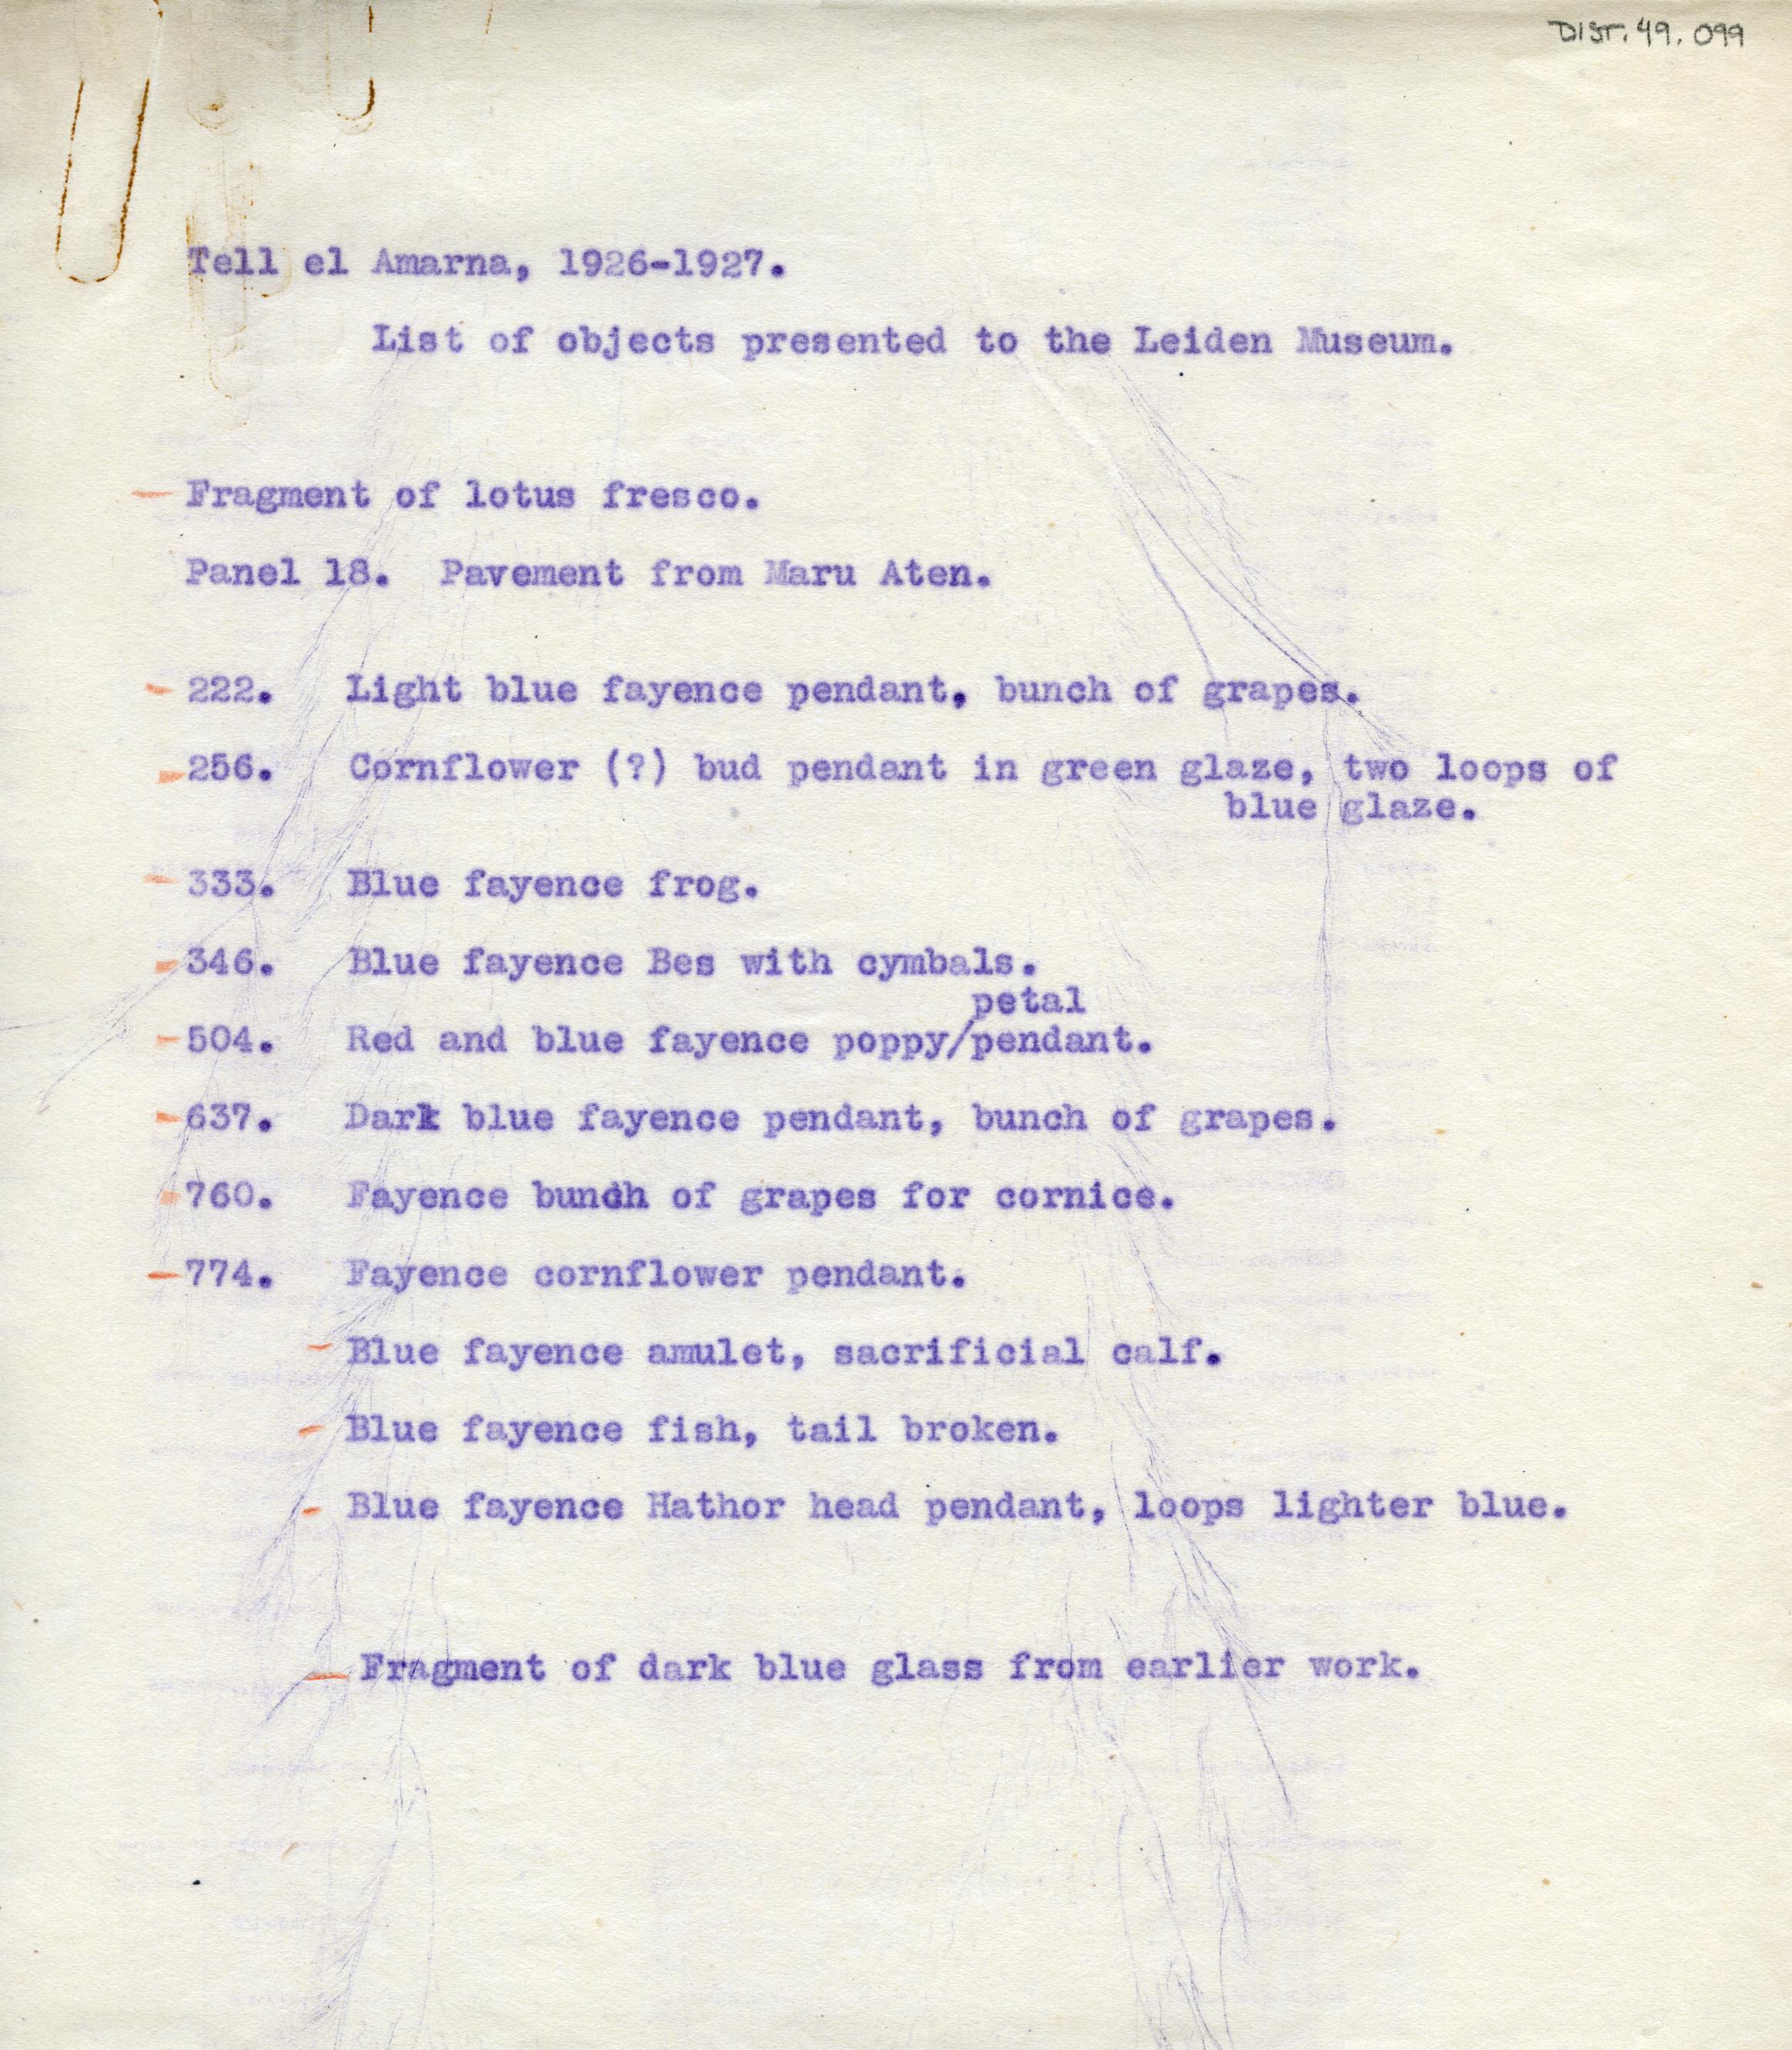 1926-27 el-Amarna DIST.49.099